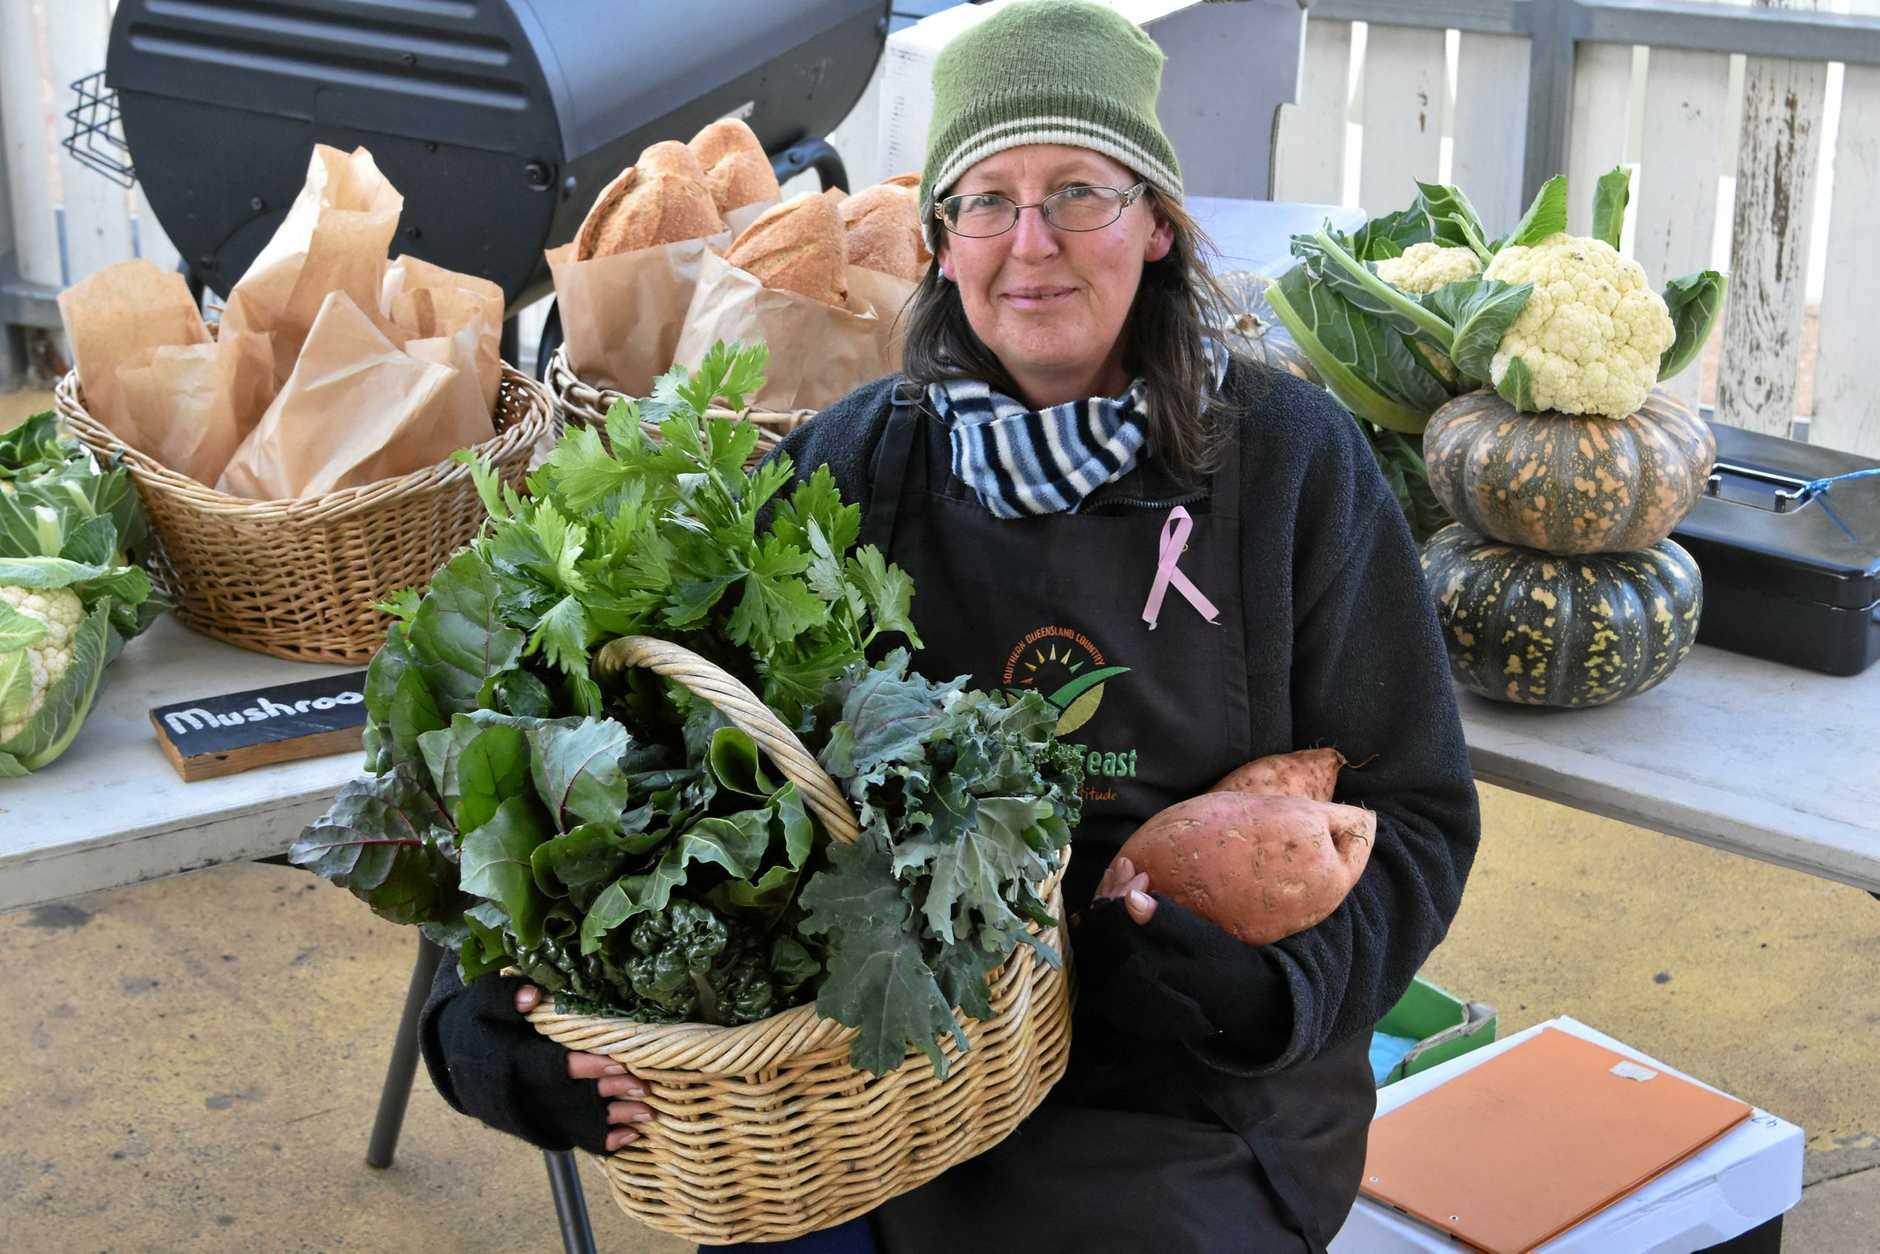 Natasha Jackson selling local produce at the Seasonal Feast Farmers Market